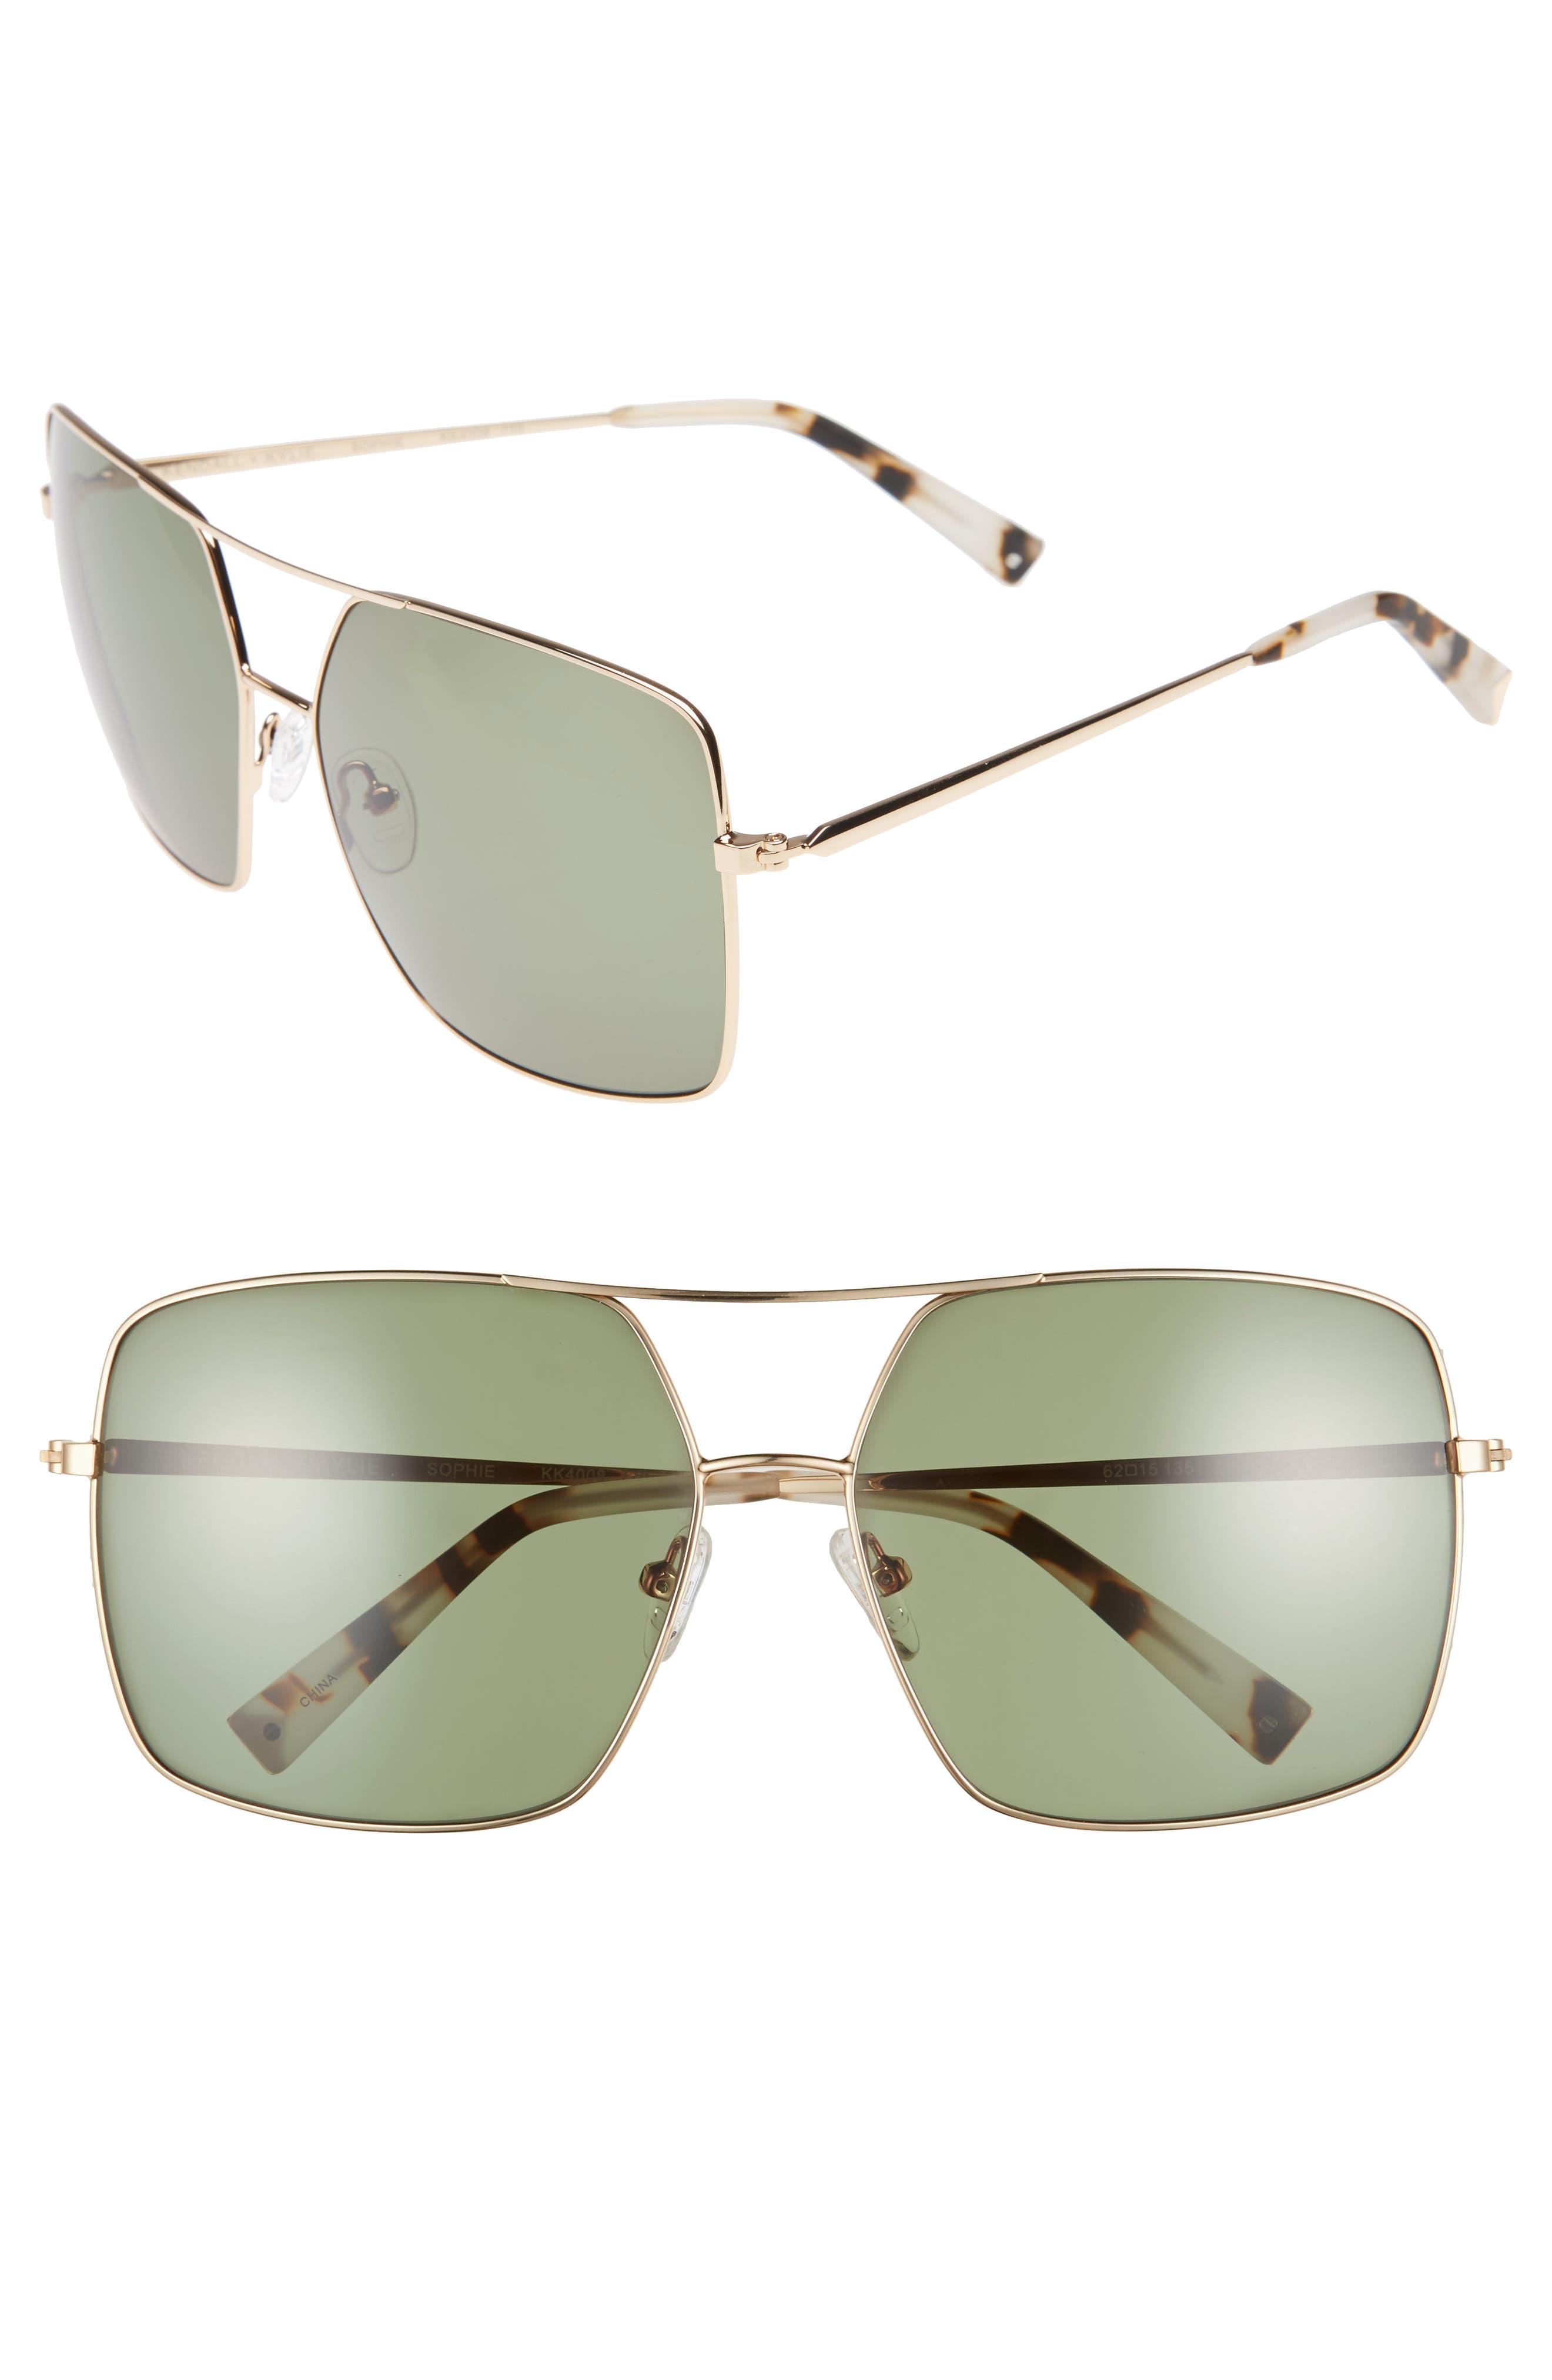 Alternate Image 1 Selected - KENDALL + KYLIE 65mm Navigator Sunglasses